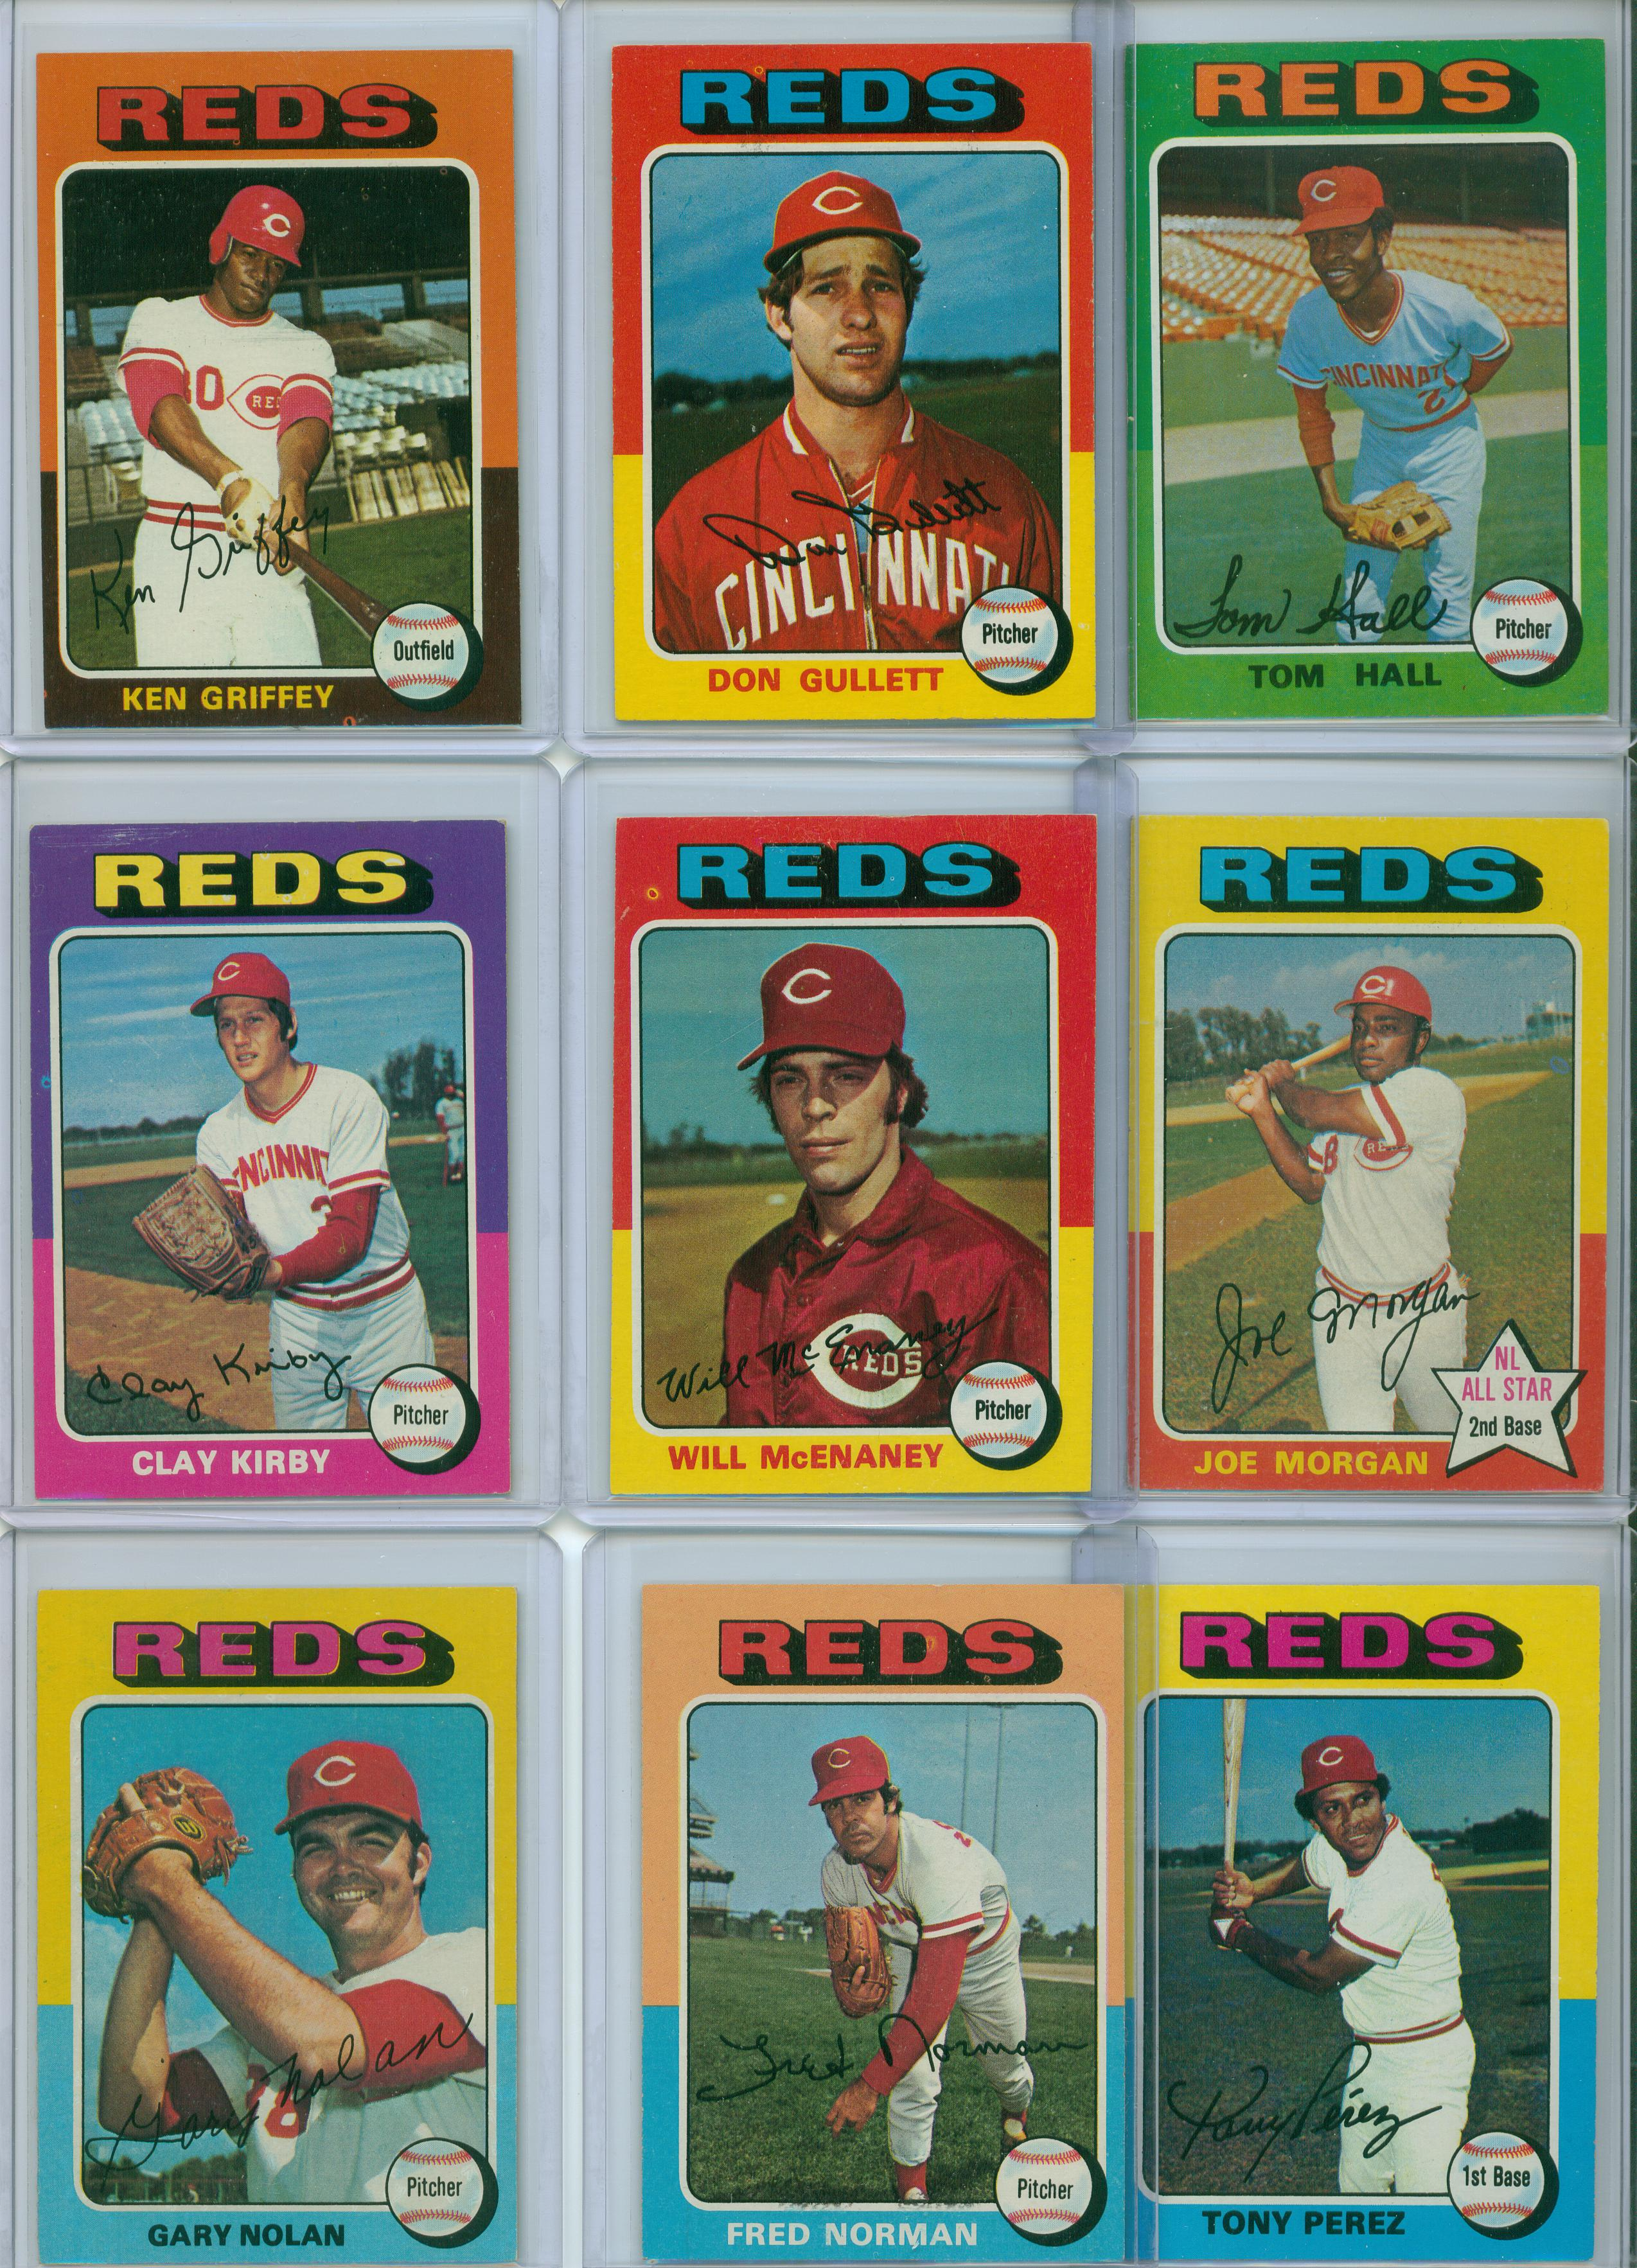 1975 Cincinnati Reds Team Set 30 Year Old Cardboard